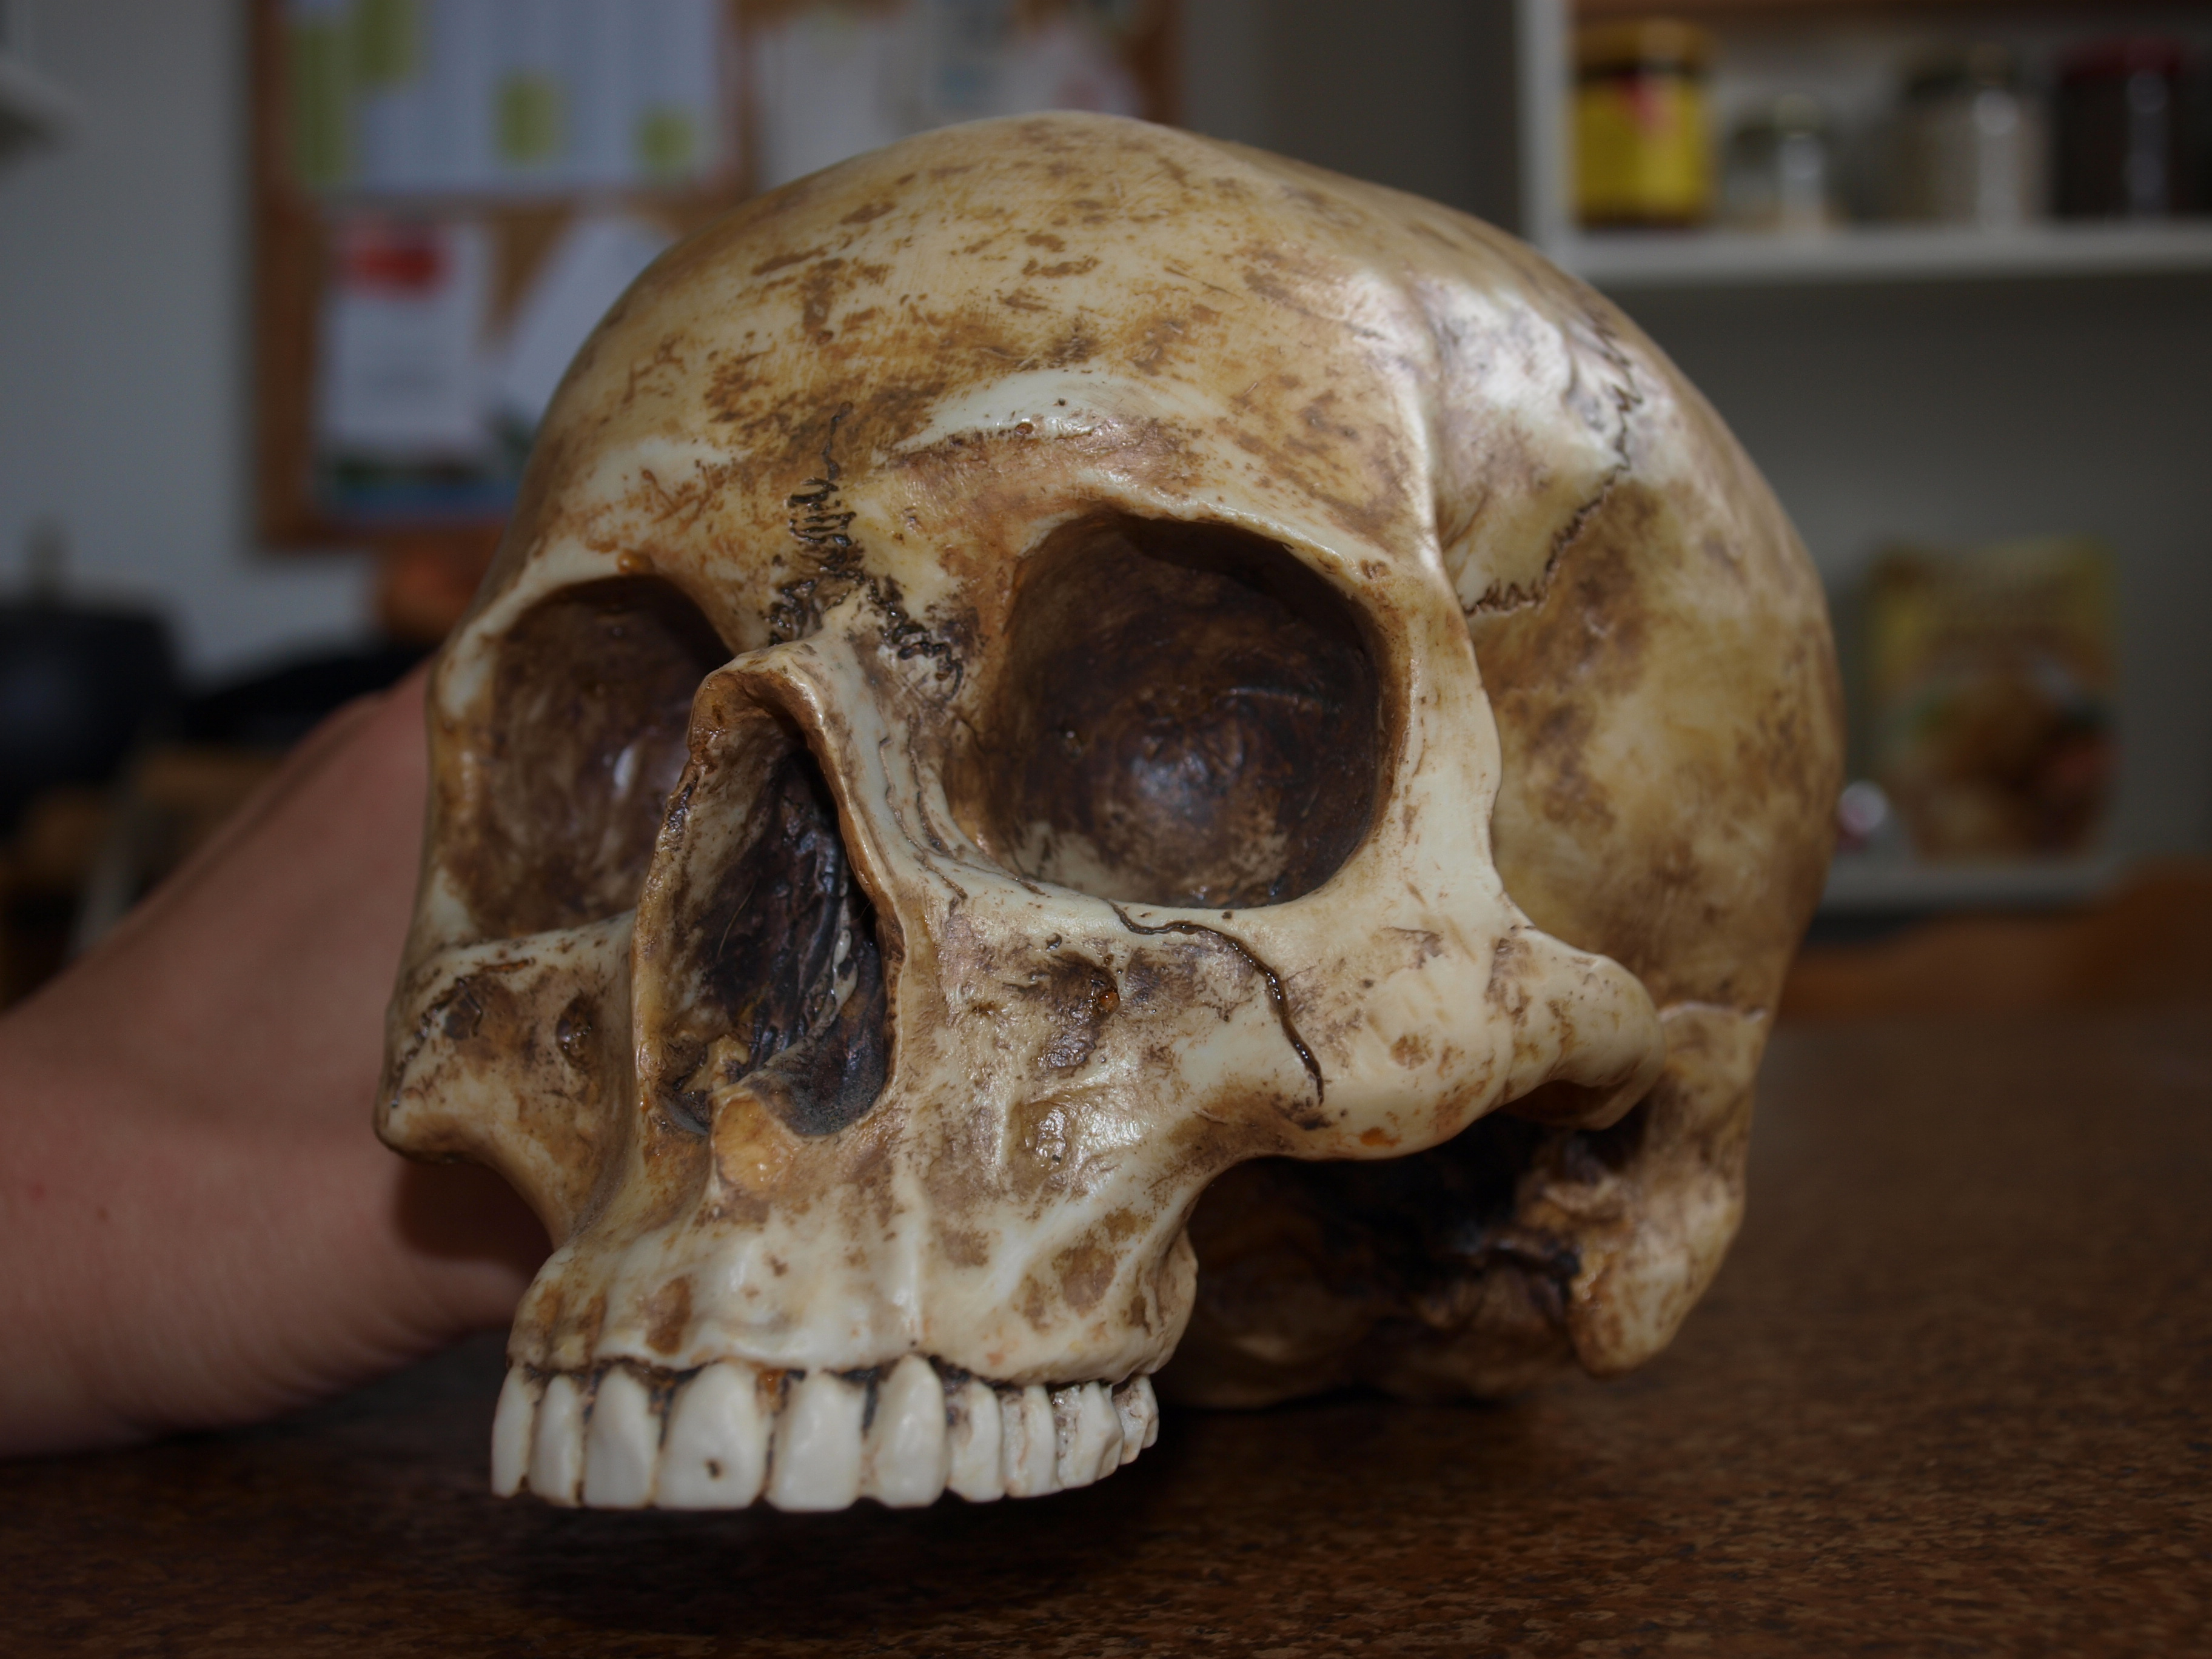 Skull Stock 09 by PsykoHilly